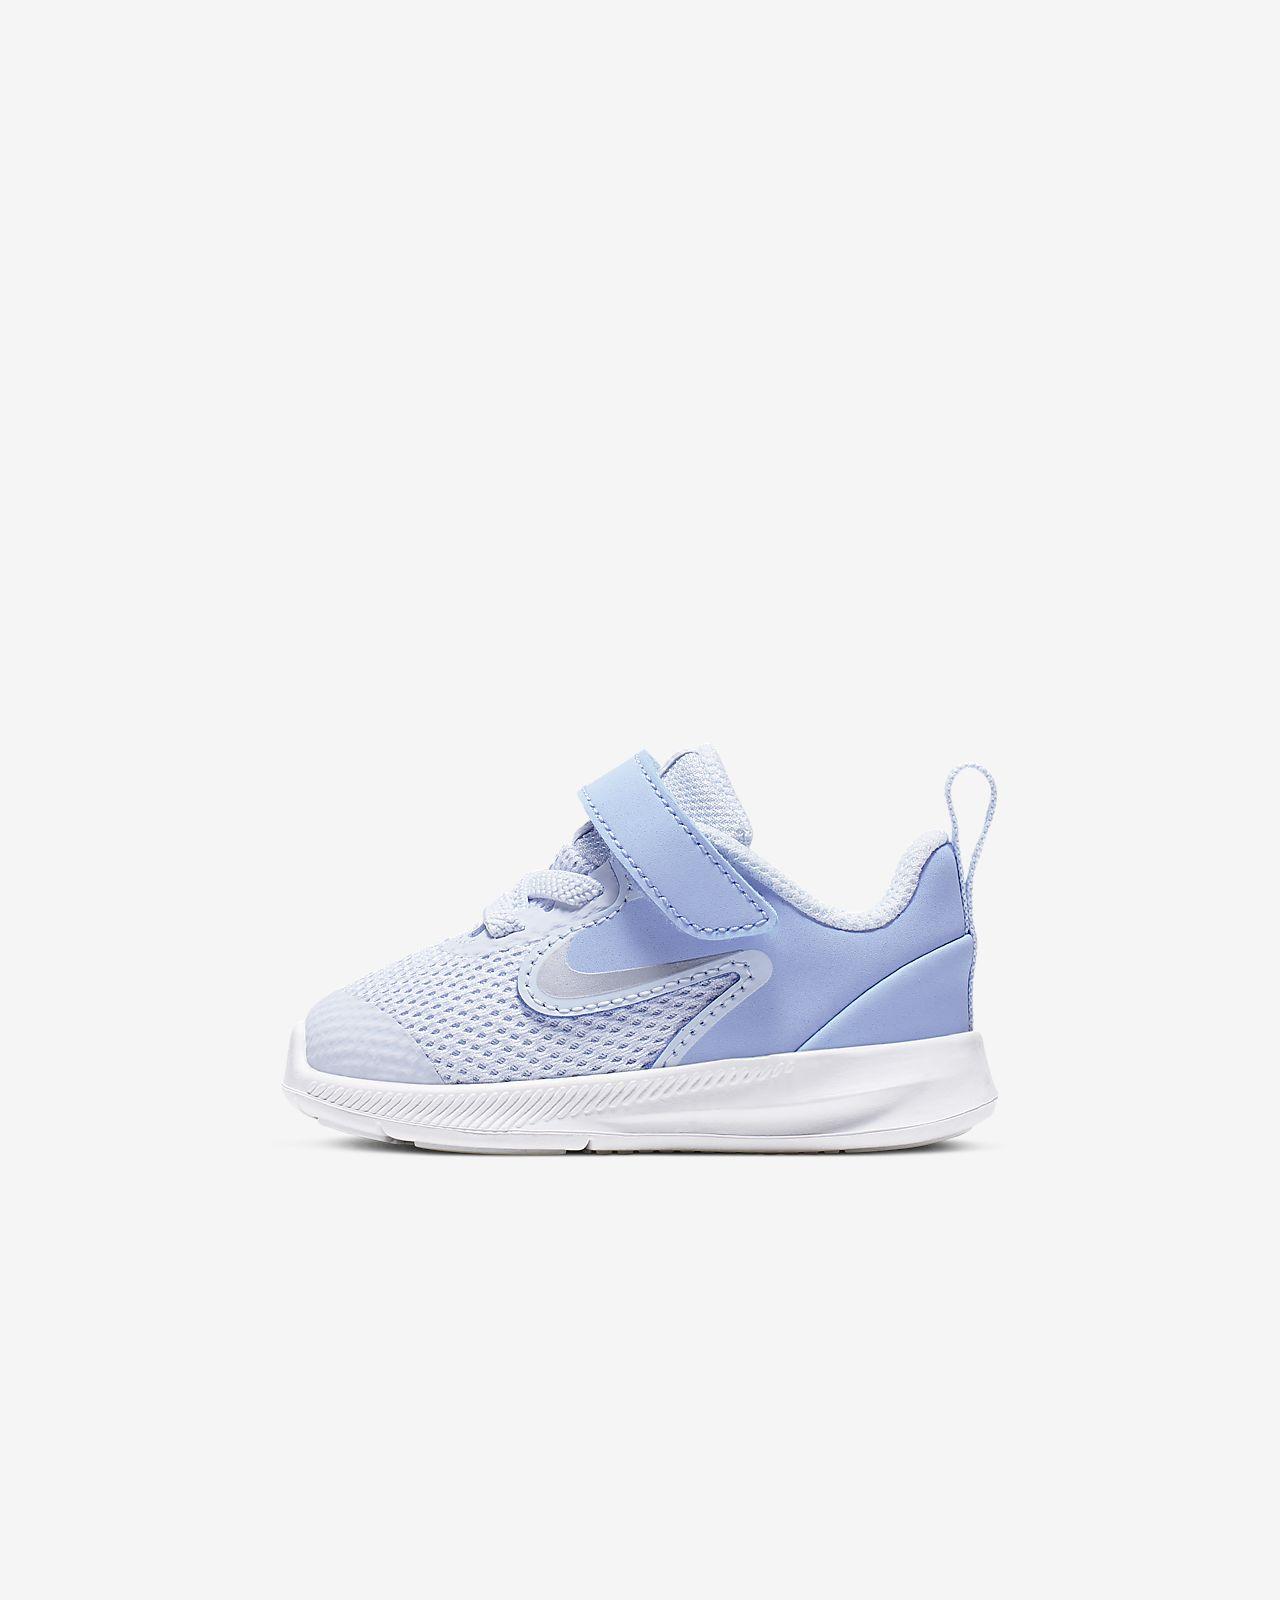 3ce74d9974f79 Nike Downshifter 9 Infant Toddler Shoe. Nike.com